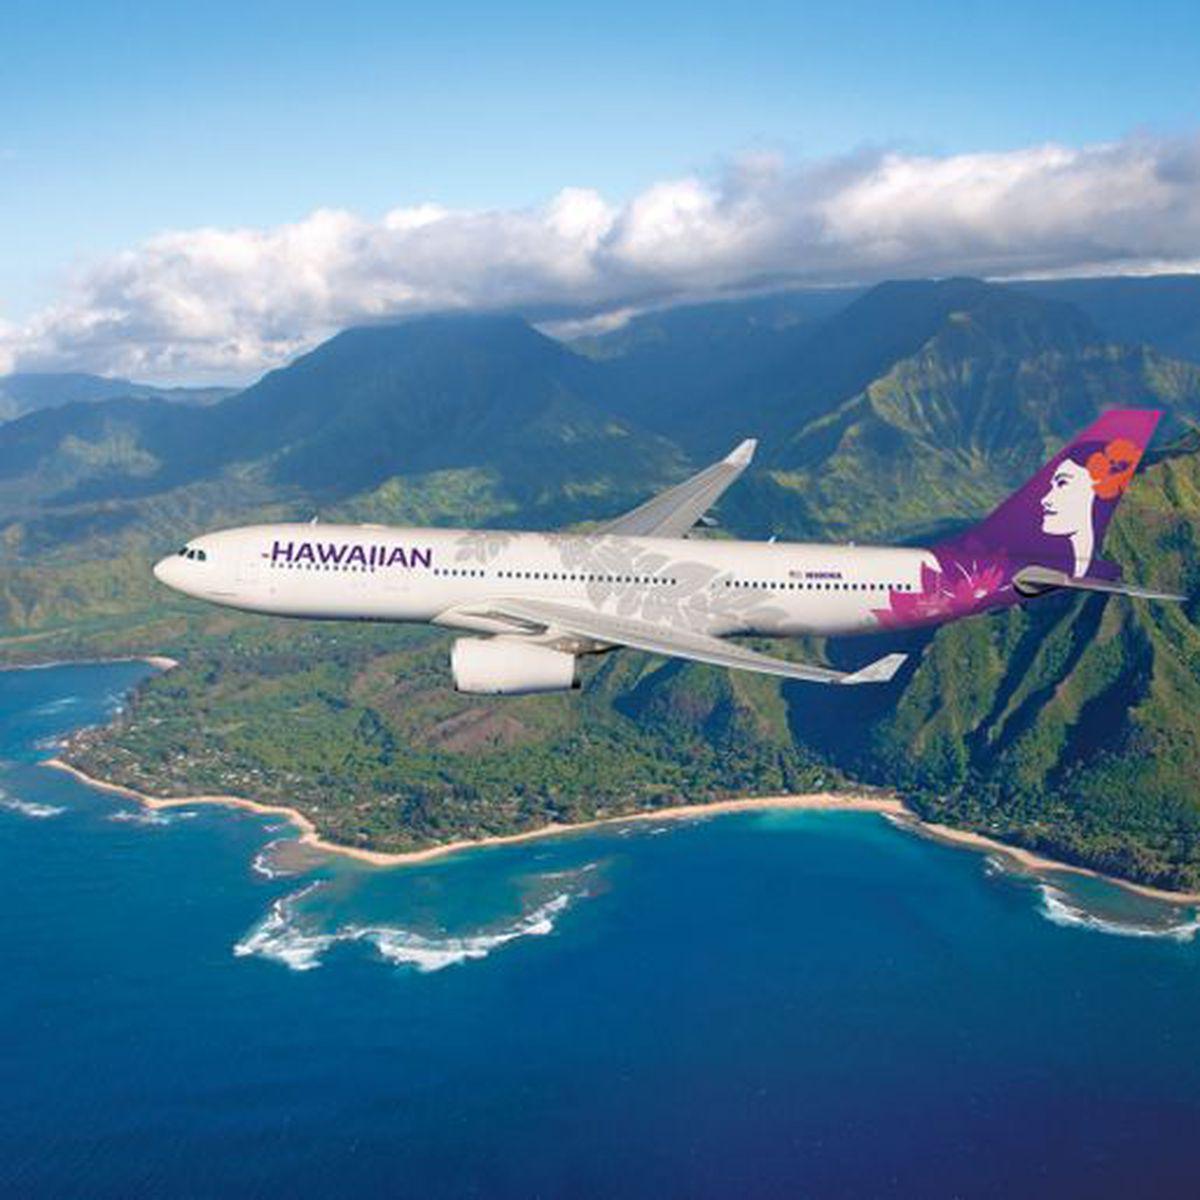 Hawaiian Air to offer drive-thru COVID-19 testing near some airports